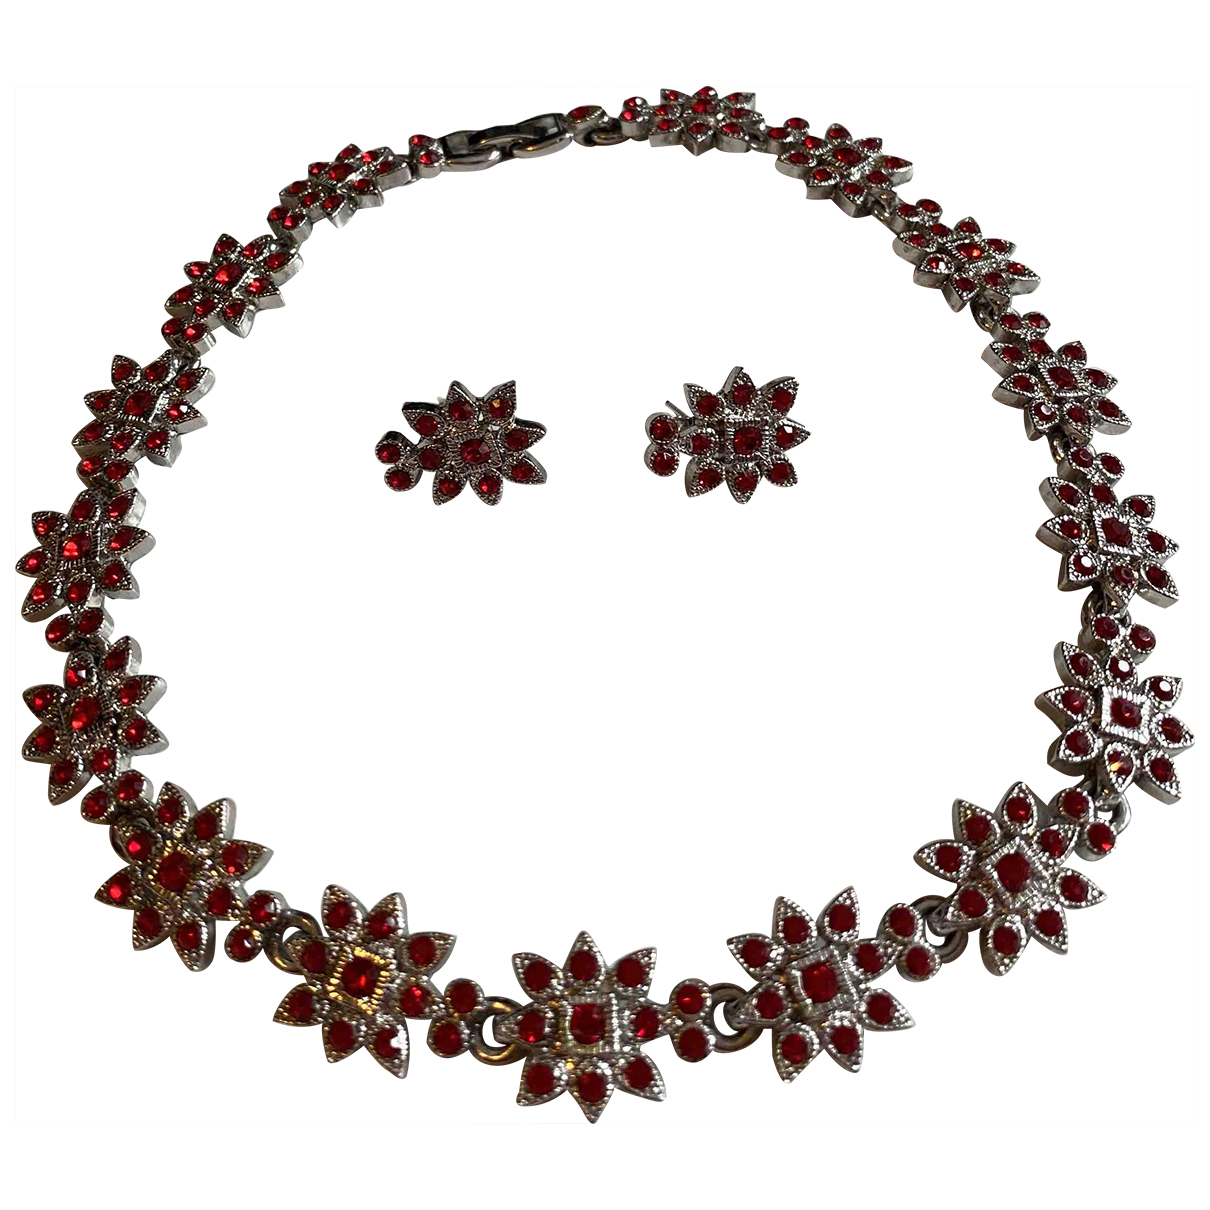 Non Signe / Unsigned Motifs Floraux Schmuck-set in  Rot Metall